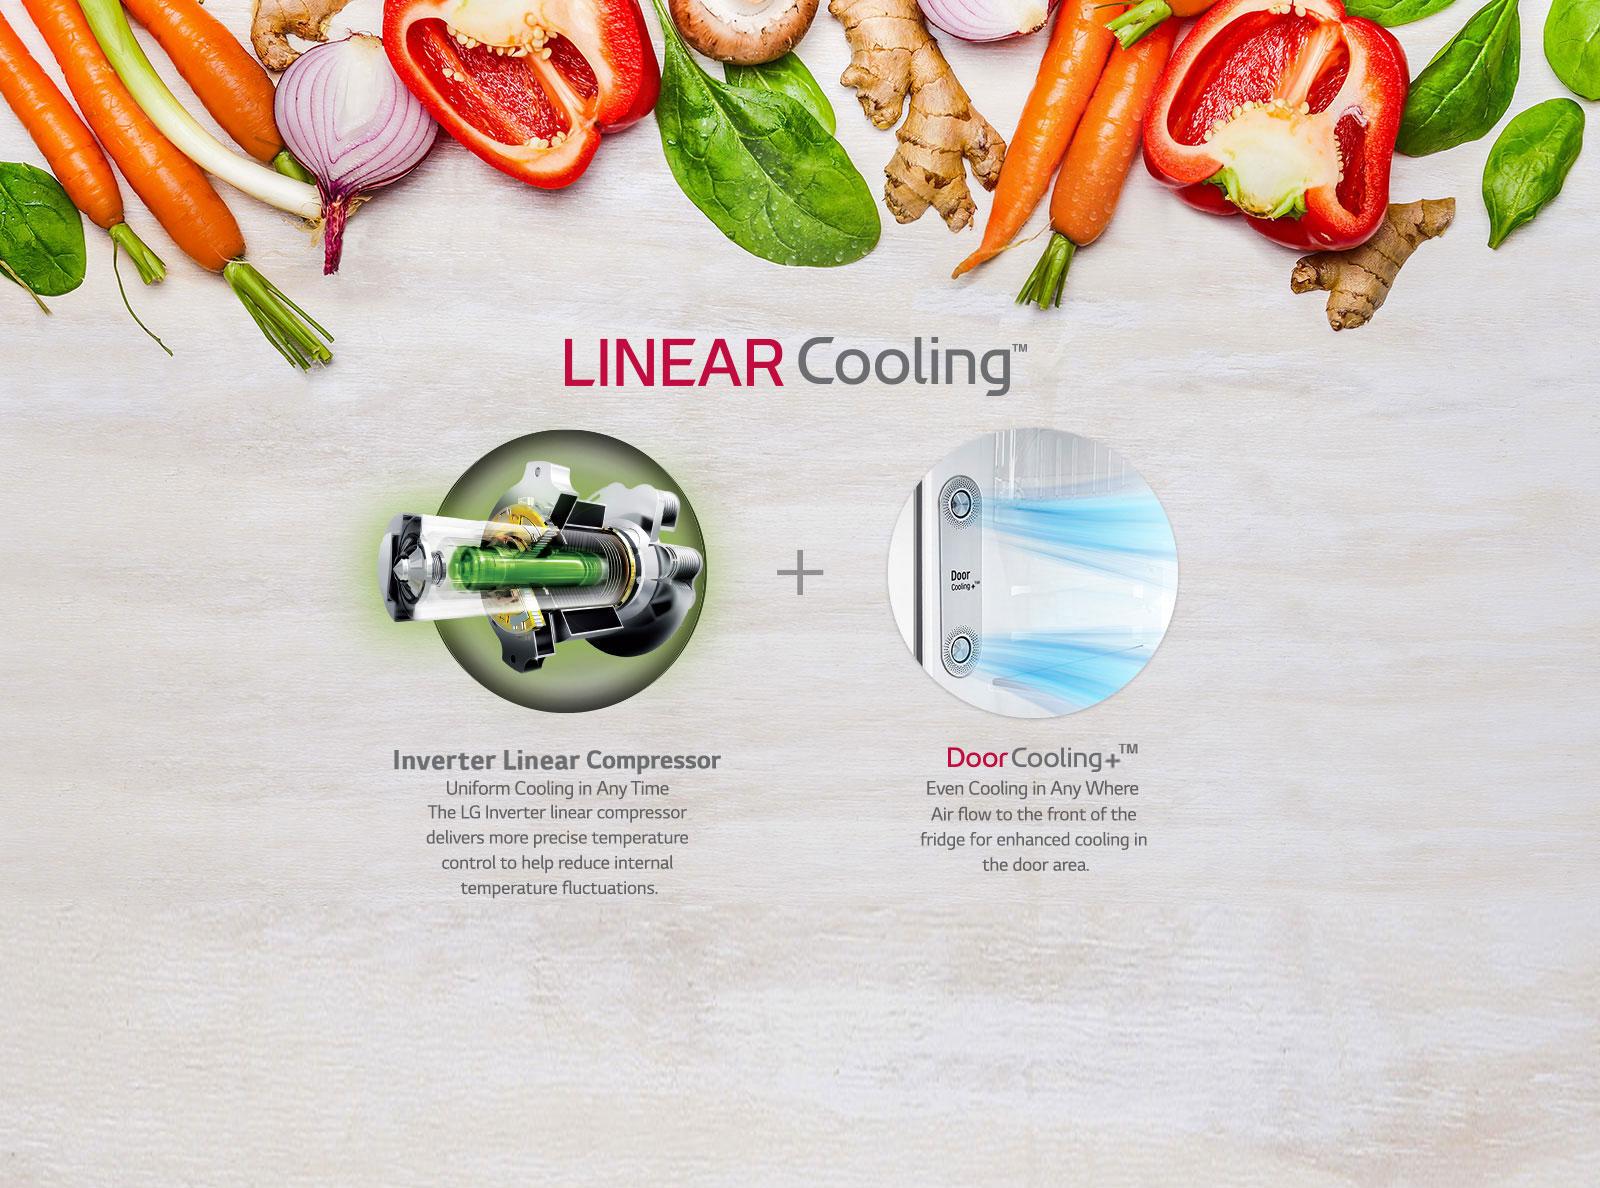 LG GL-T372JPZ3 335 Ltr Linear Cooling